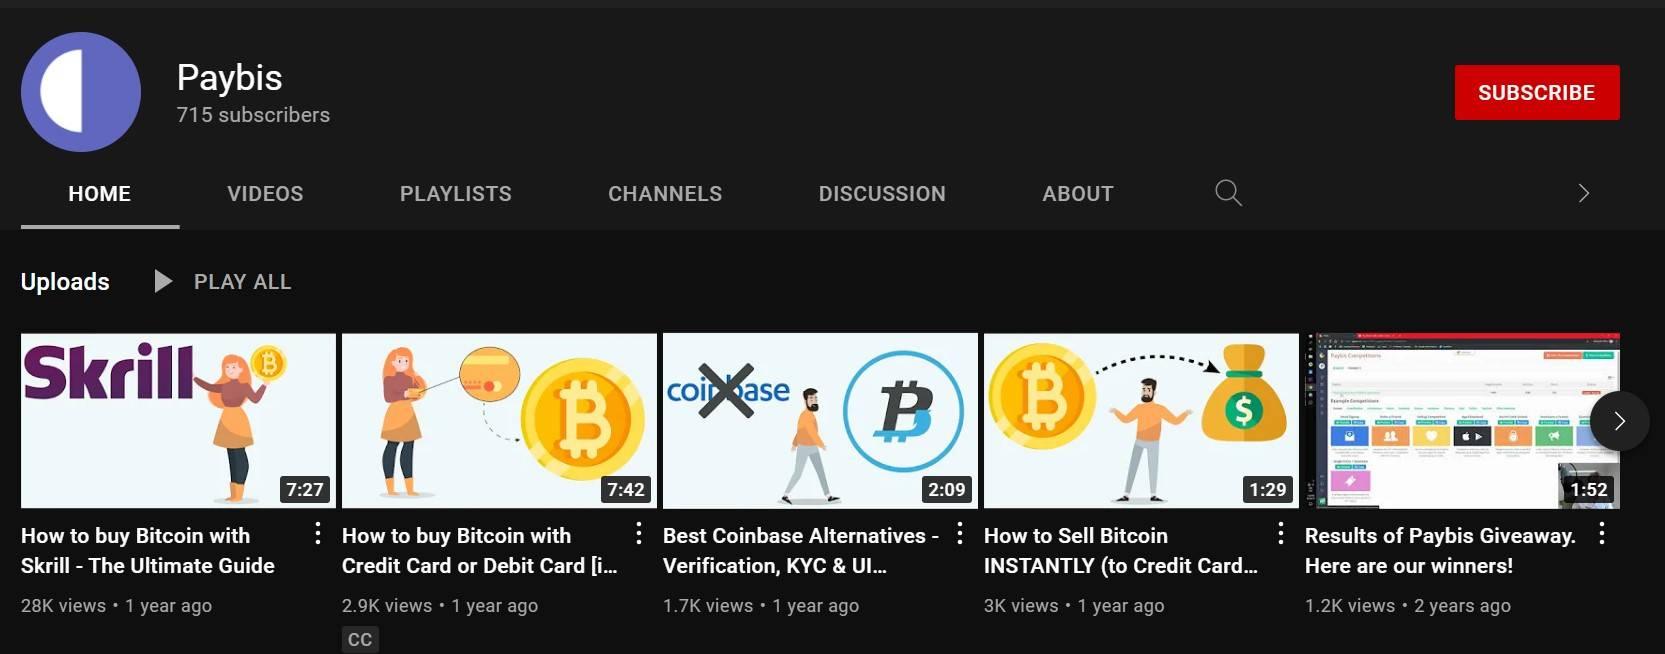 chaîne YouTube crypto